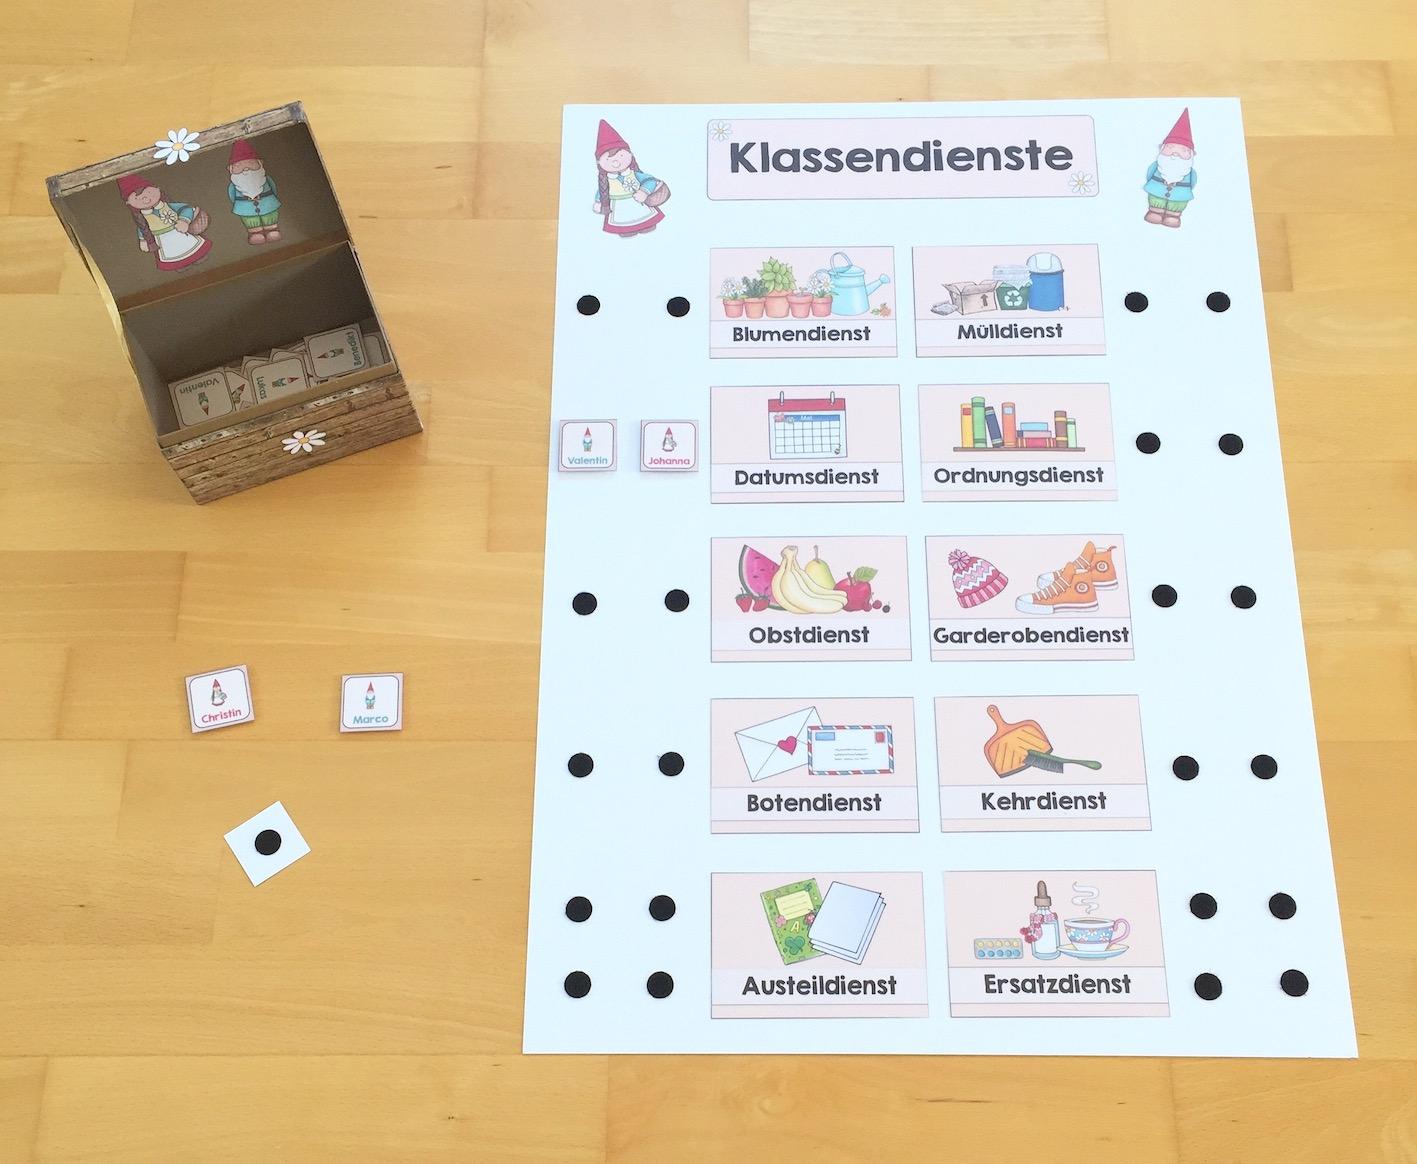 Ordnungsdienst klassenzimmer  Materialwiese: Klassendienste in der Grundschule